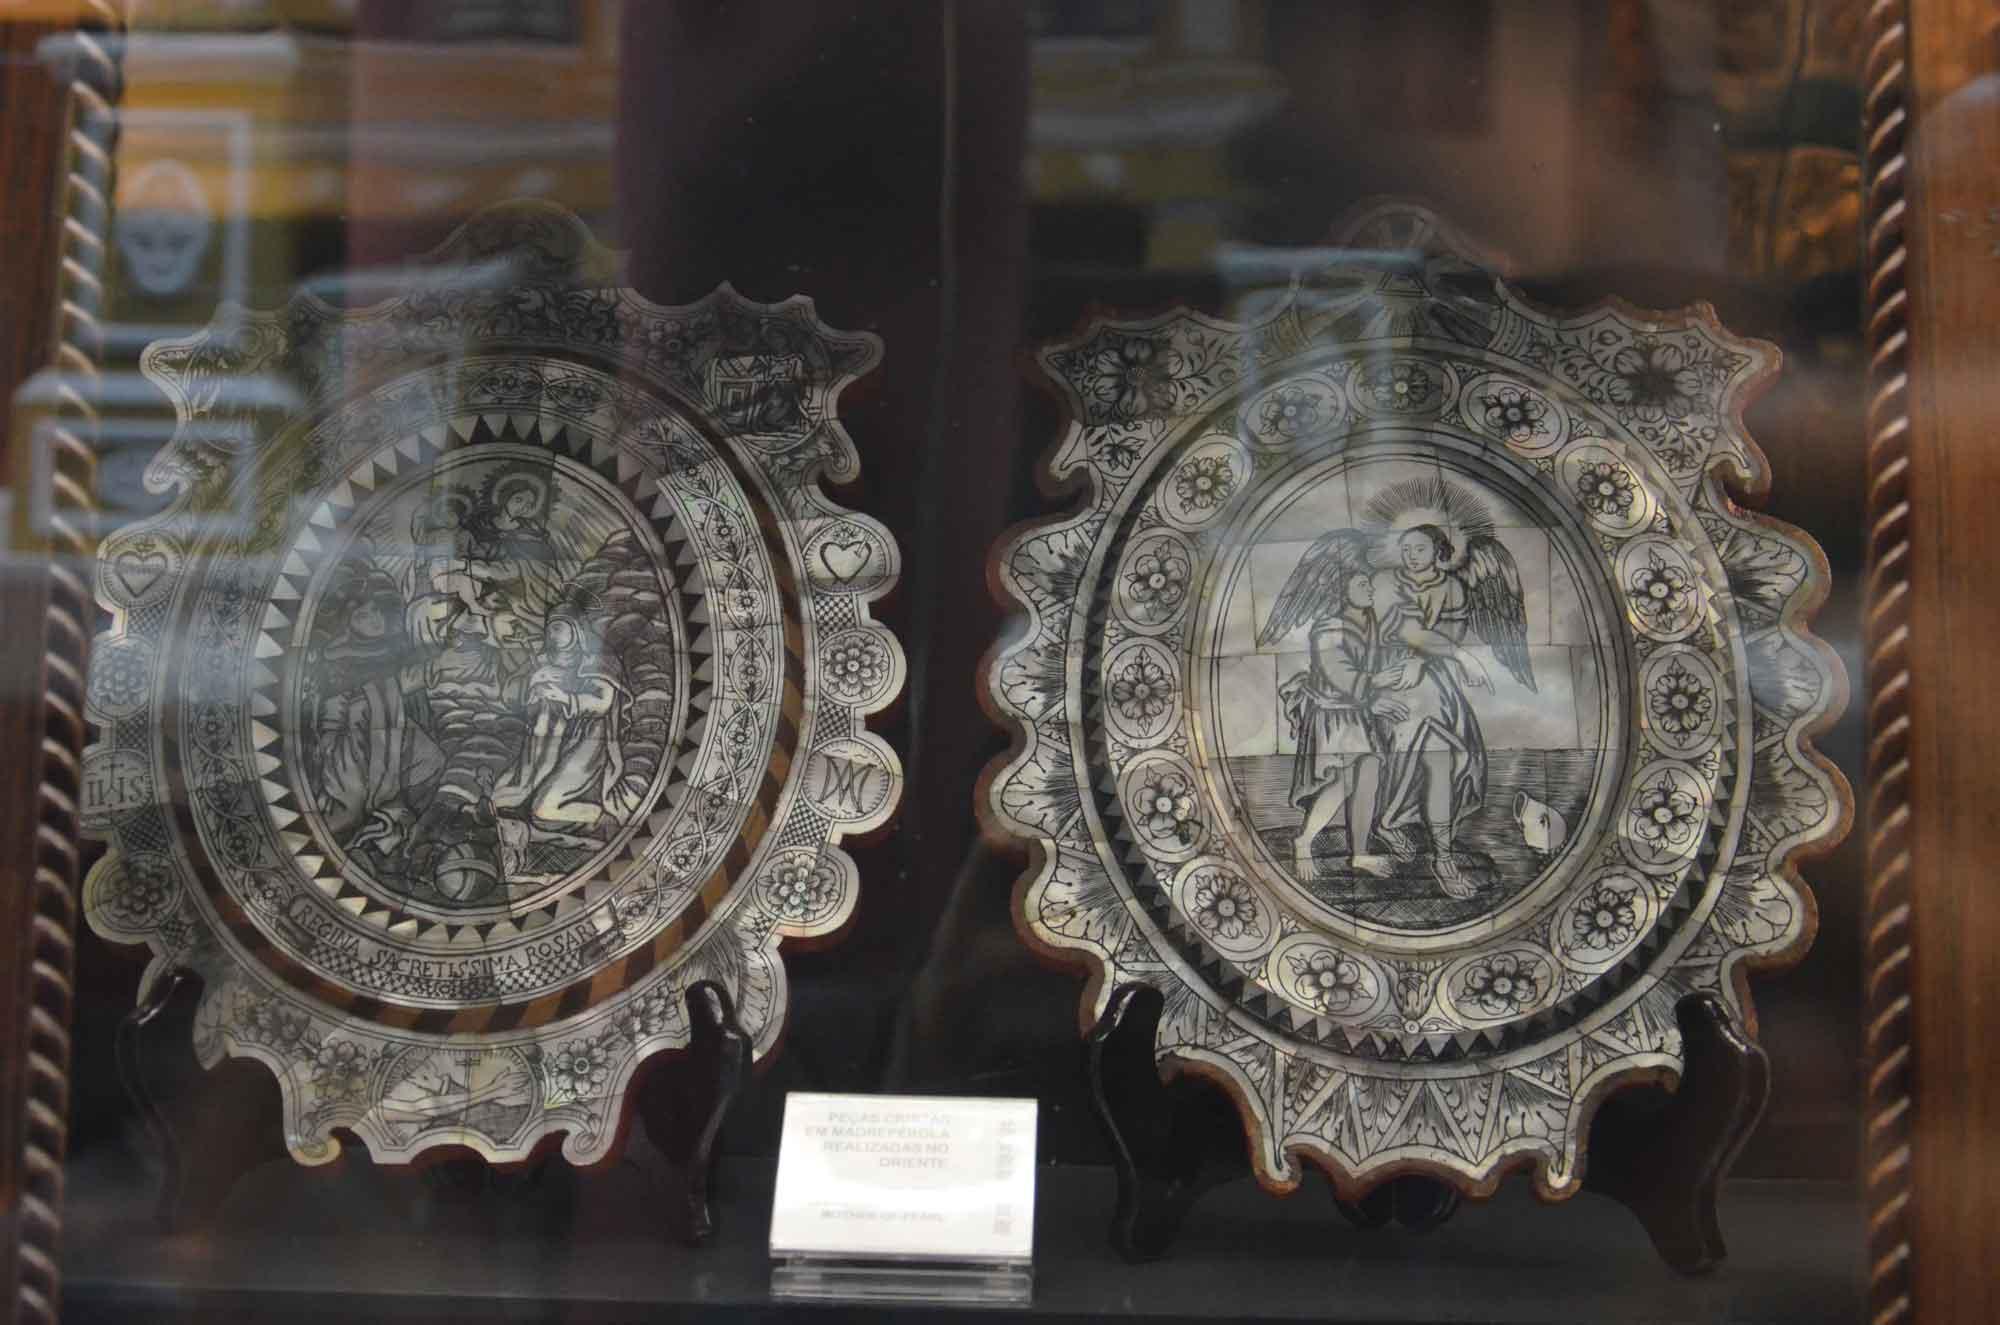 Macau Museum Christian china plates